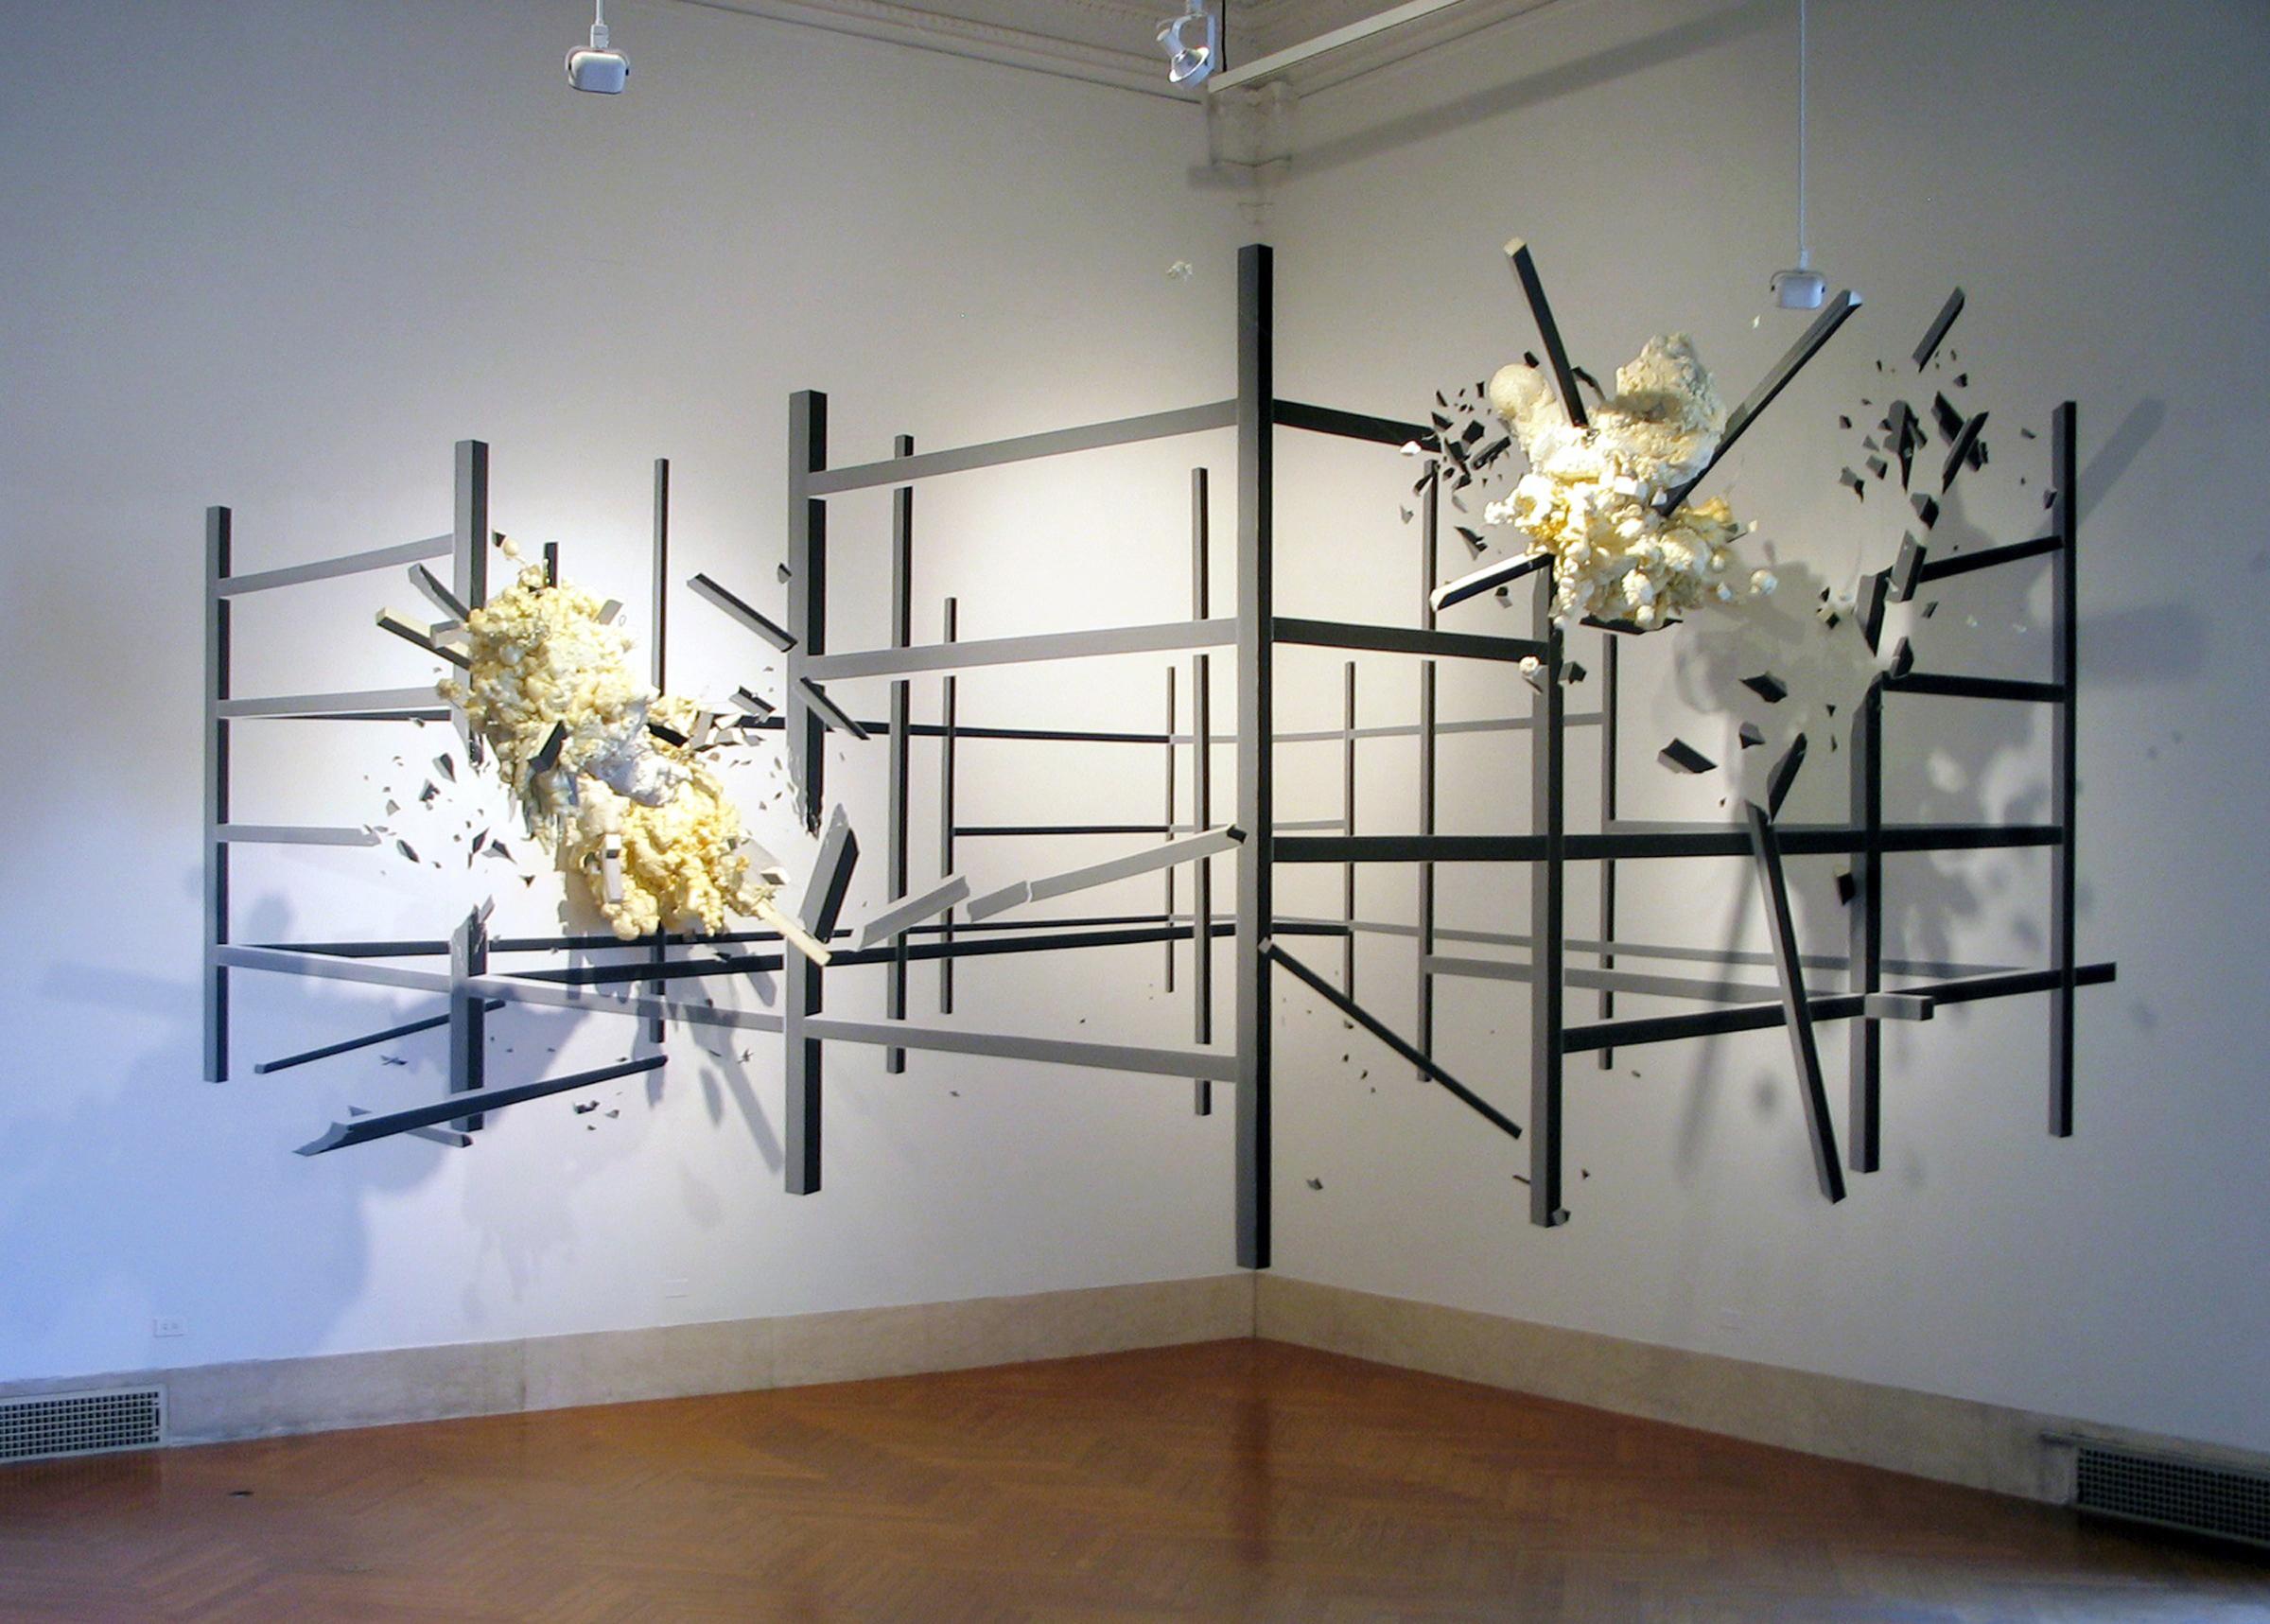 ARTnews | Ken Shulman | Mar 2006